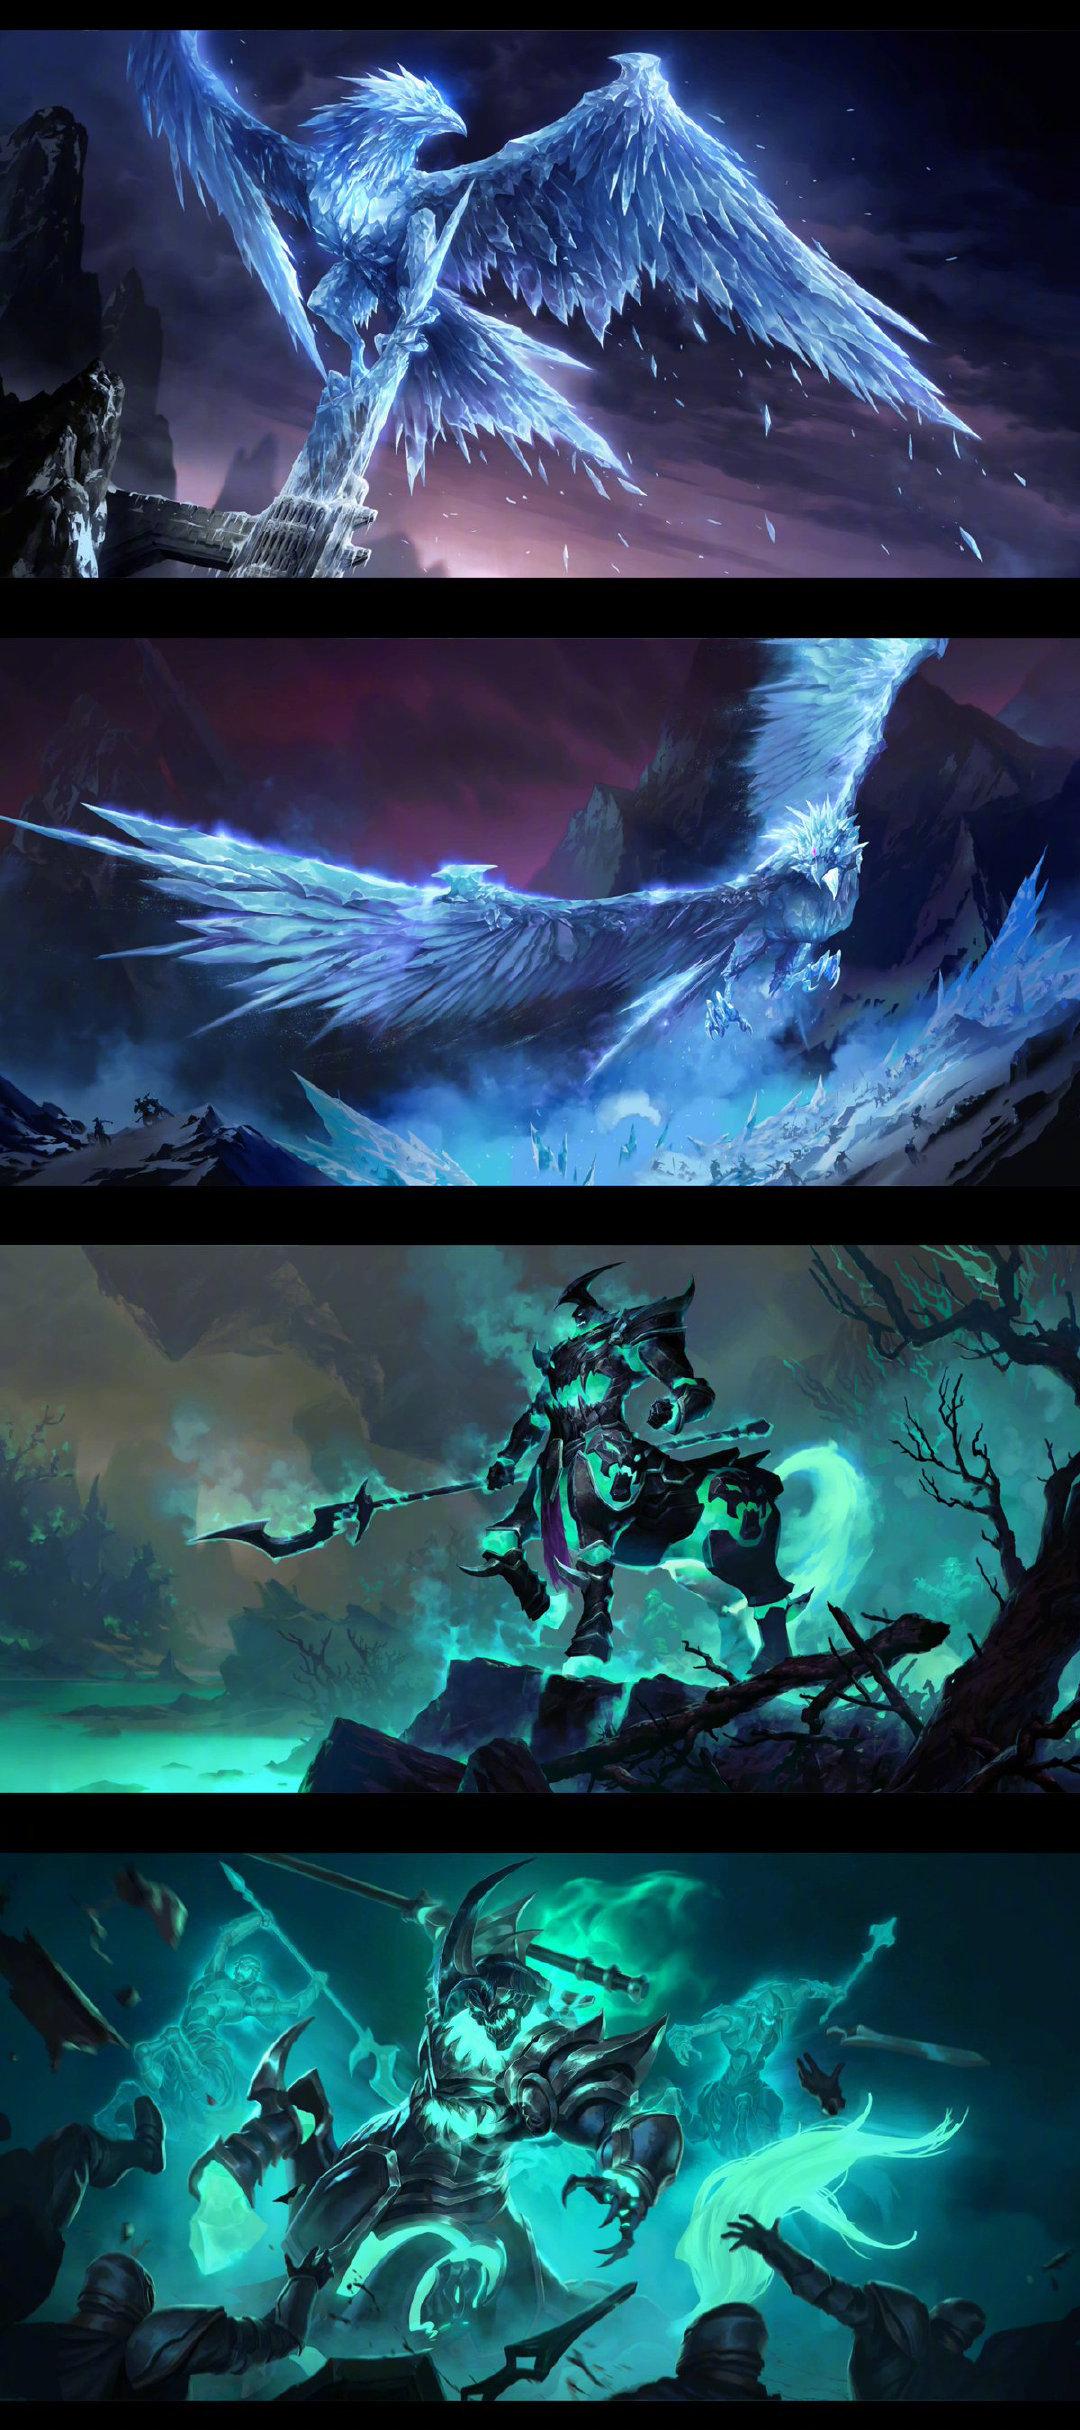 Legends of Runeterra英雄联盟卡牌游戏卡组原画太好看